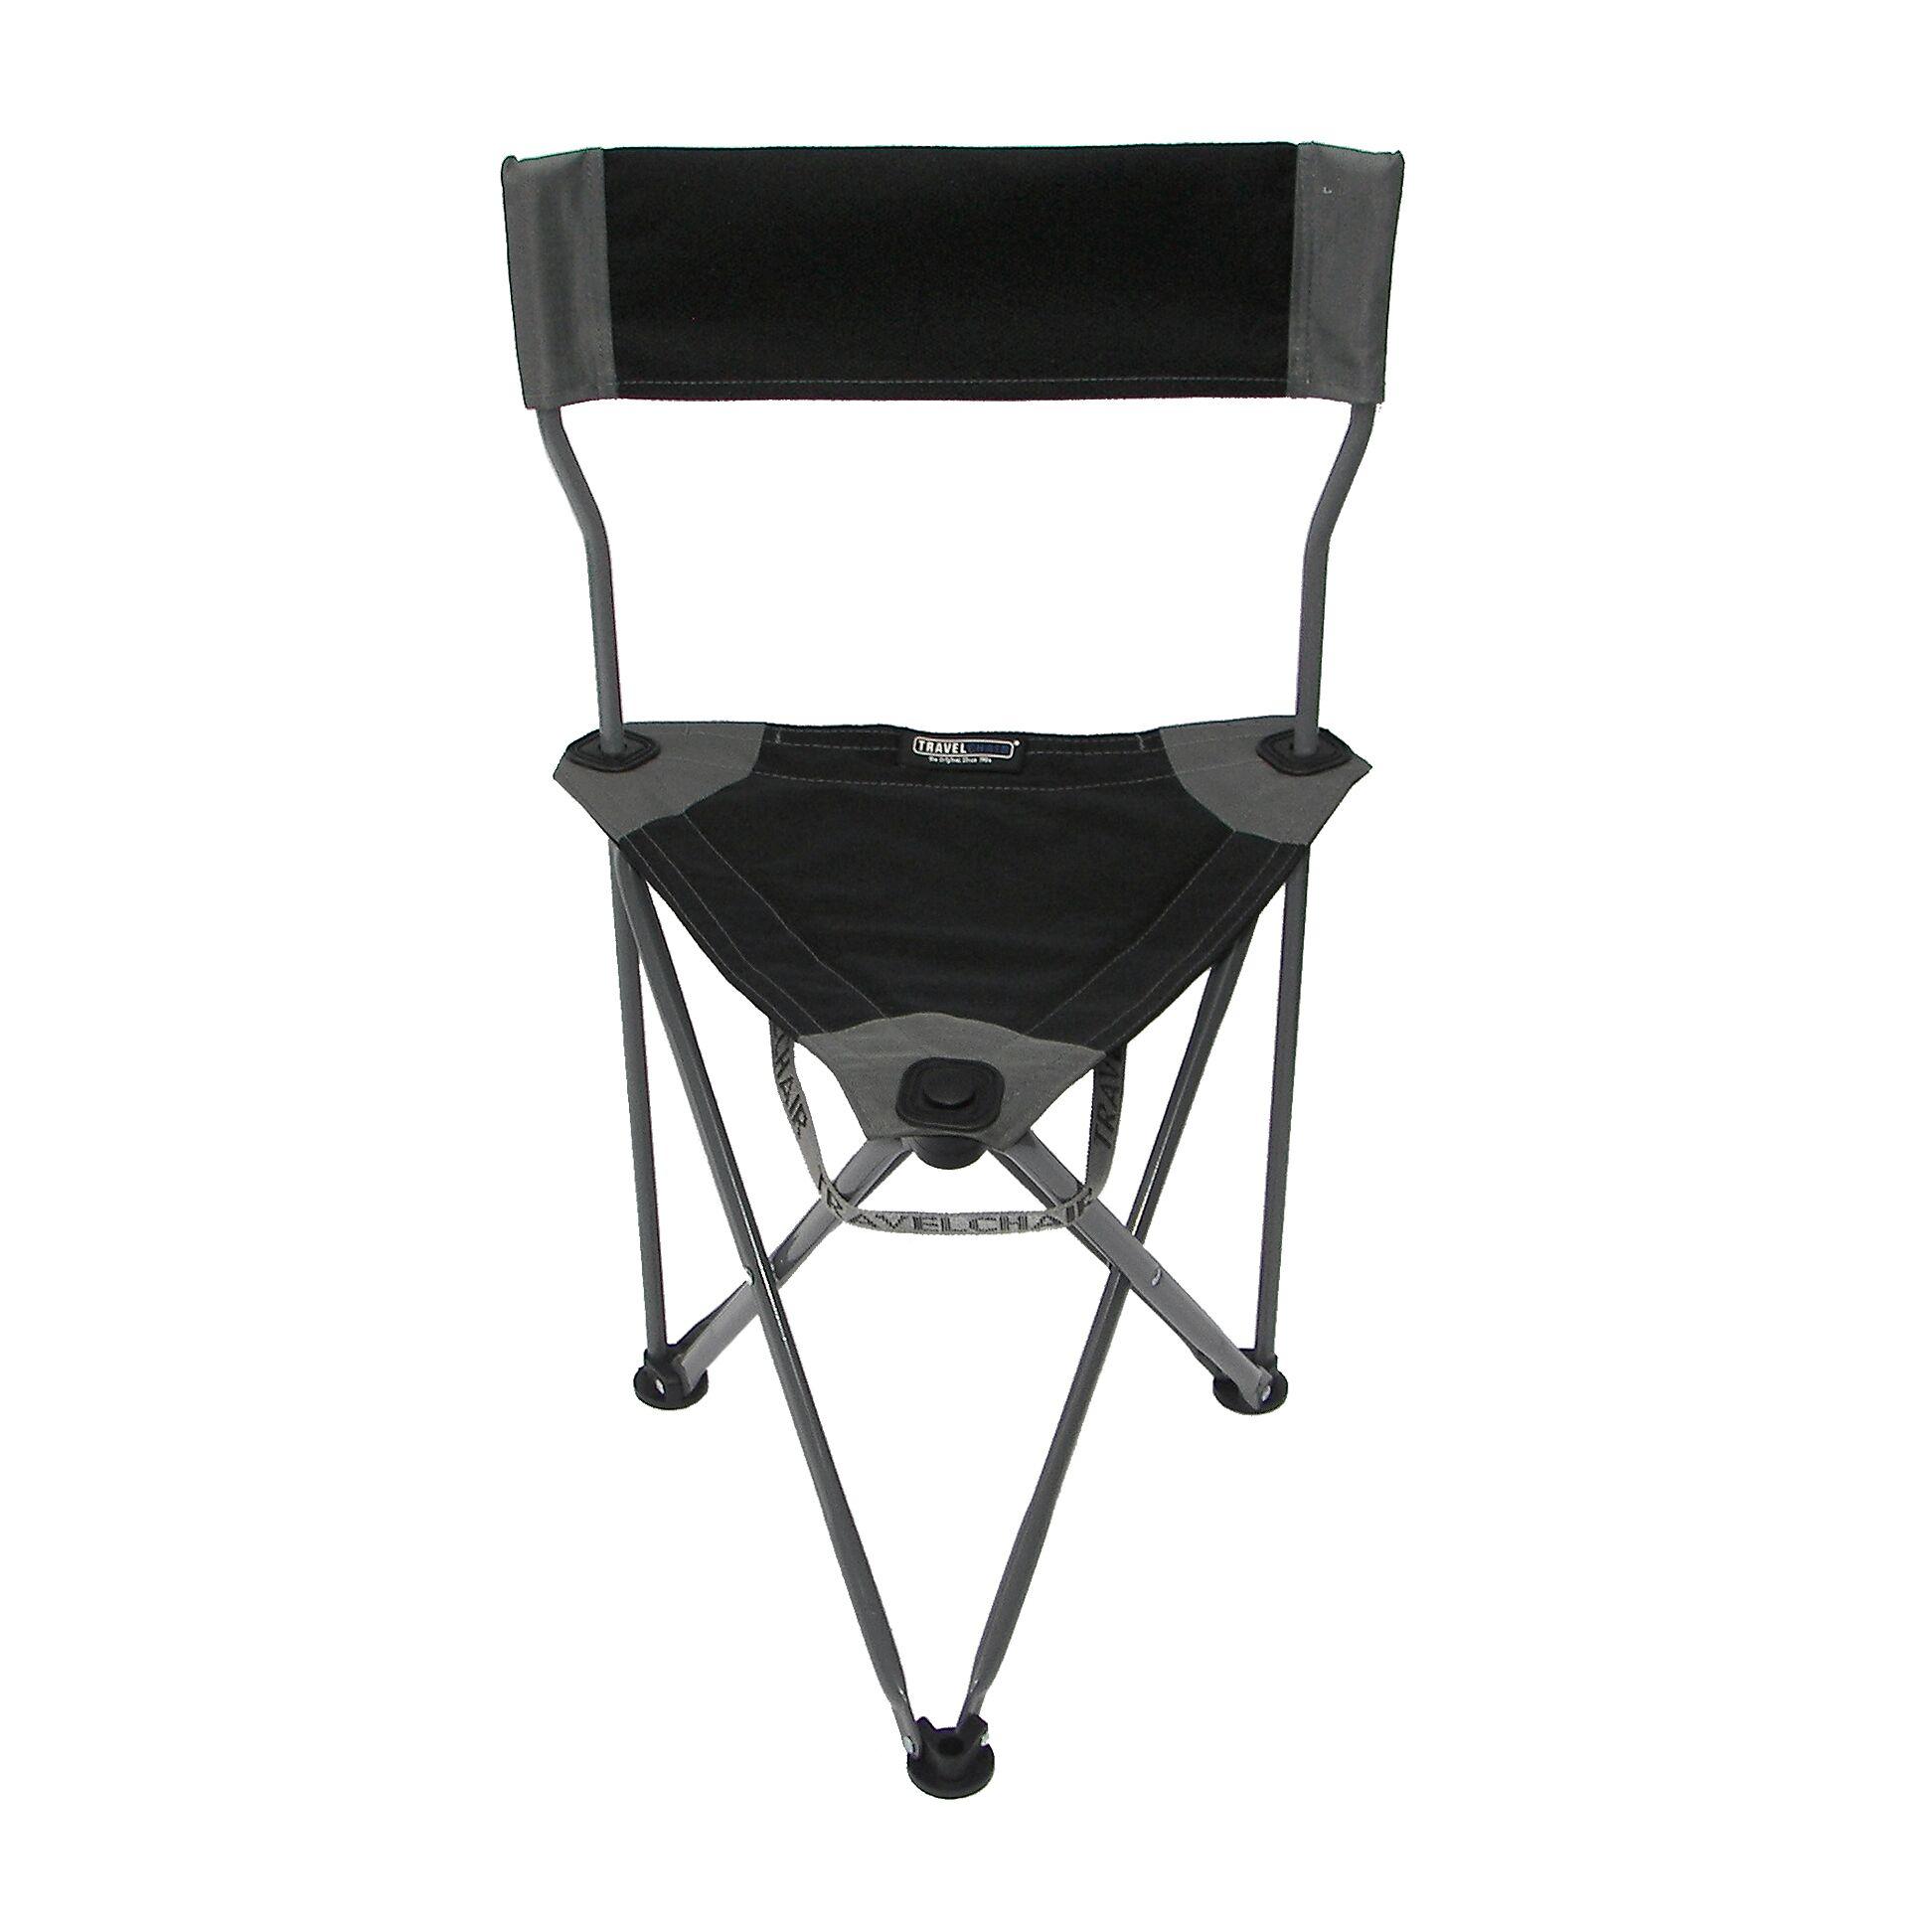 Travel Chair Ultimate Slacker 20 Folding Chair  Black